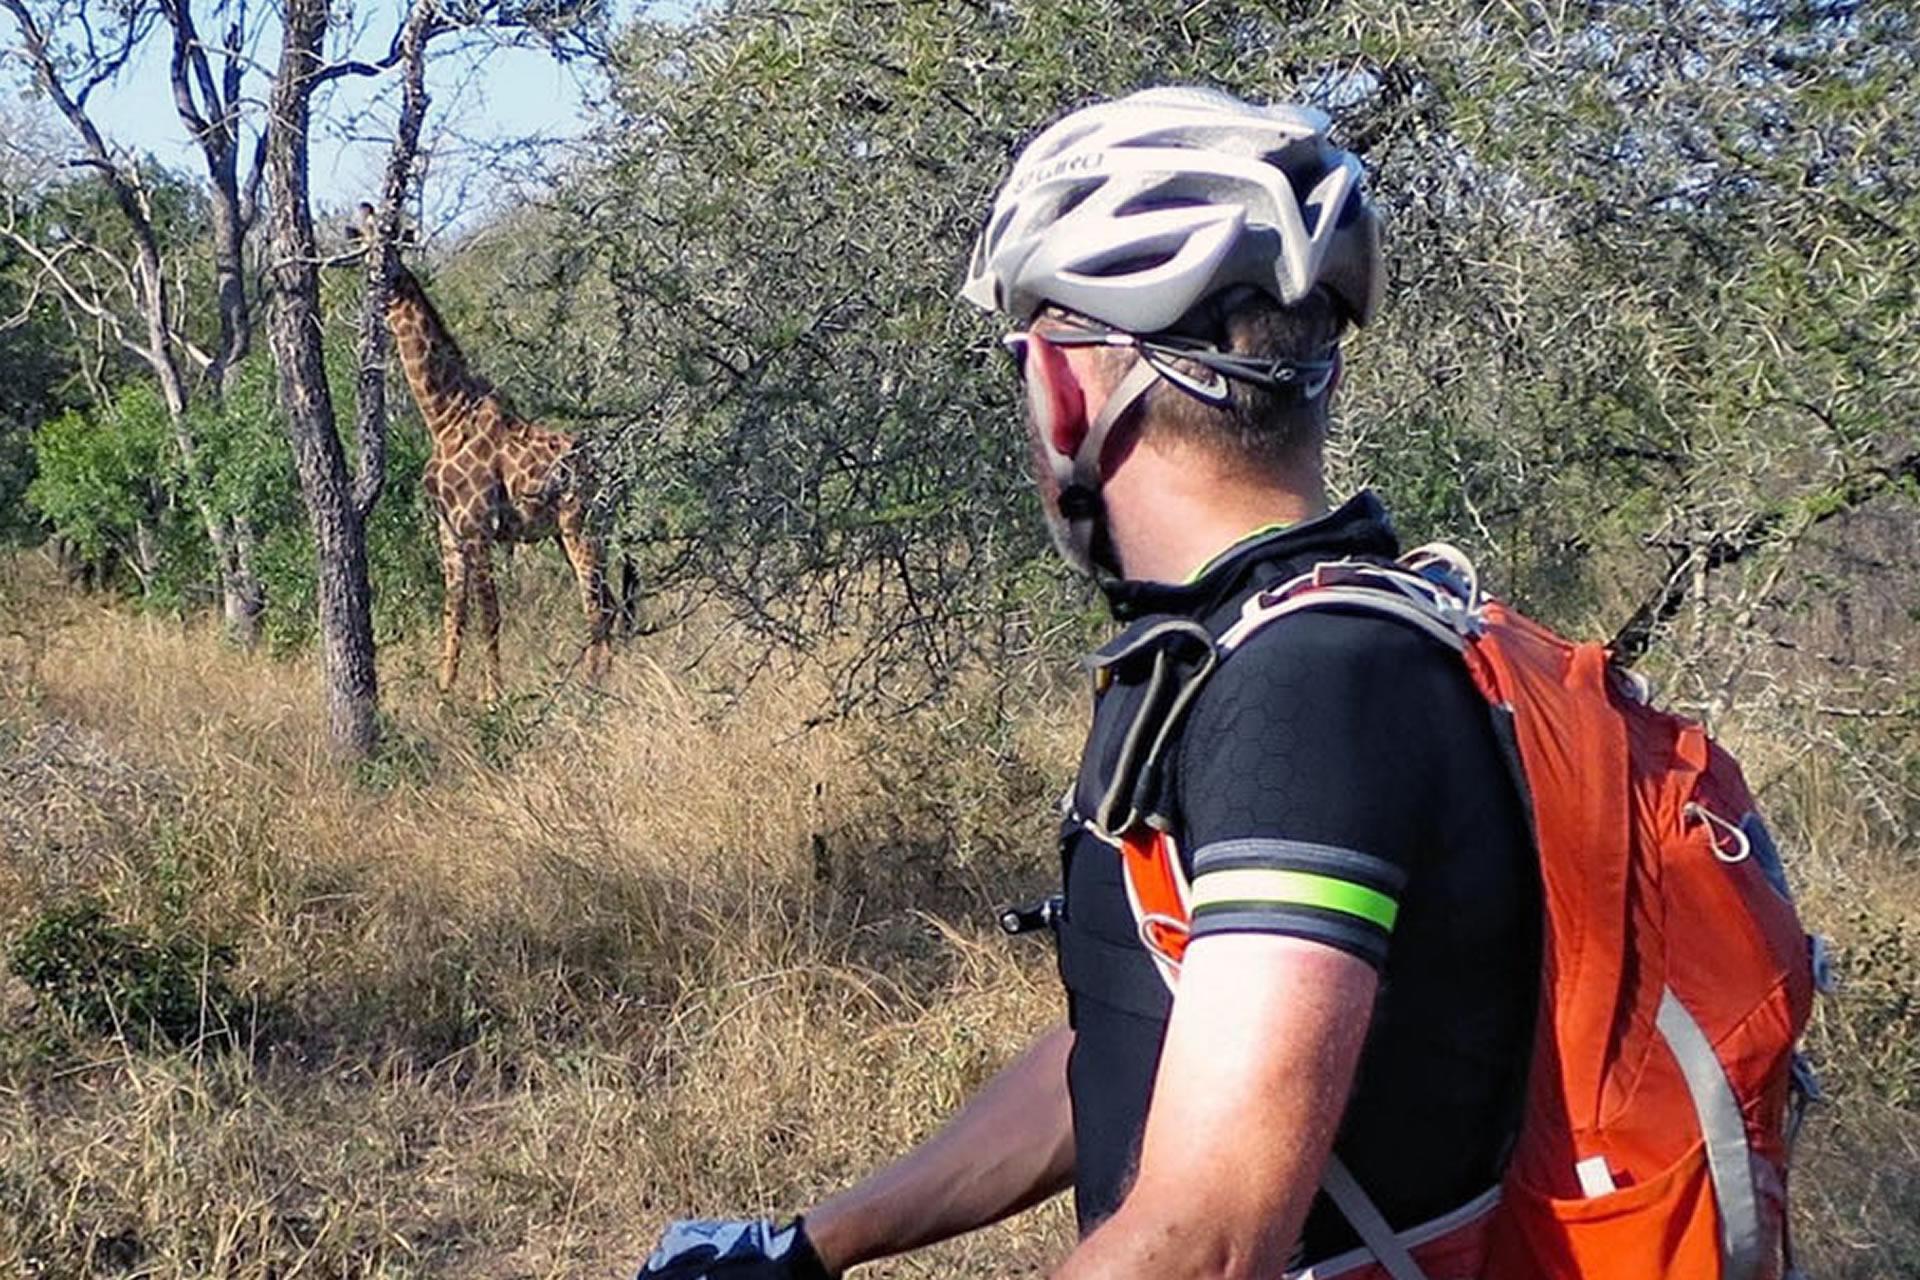 Bike-Park-Safari-Slider-2